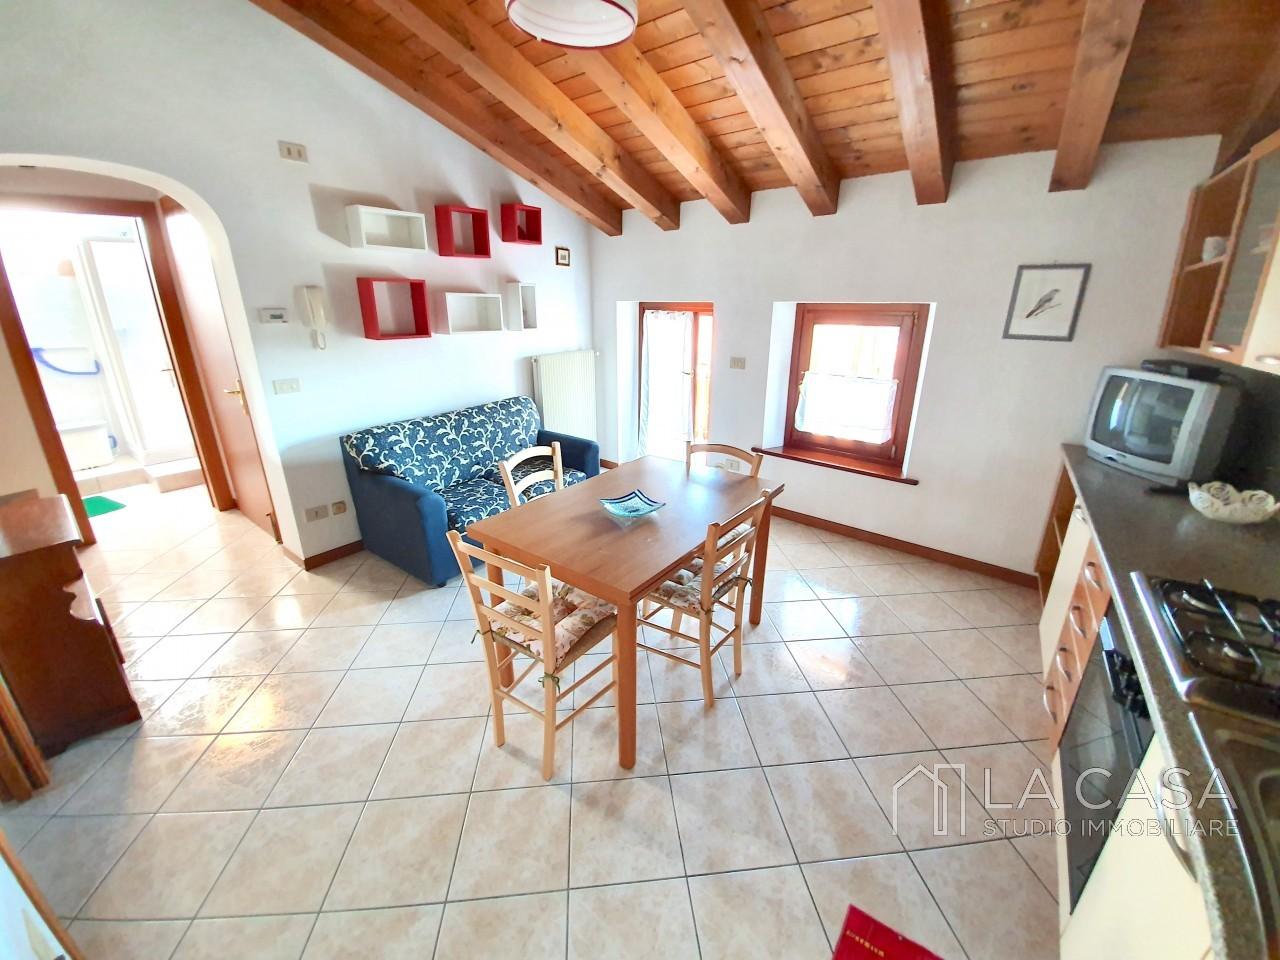 Luminosa recente mansarda in vendita a San Martino al T. - Rif.A2 https://media.gestionaleimmobiliare.it/foto/annunci/190709/2030476/1280x1280/000__20190710_161133.jpg